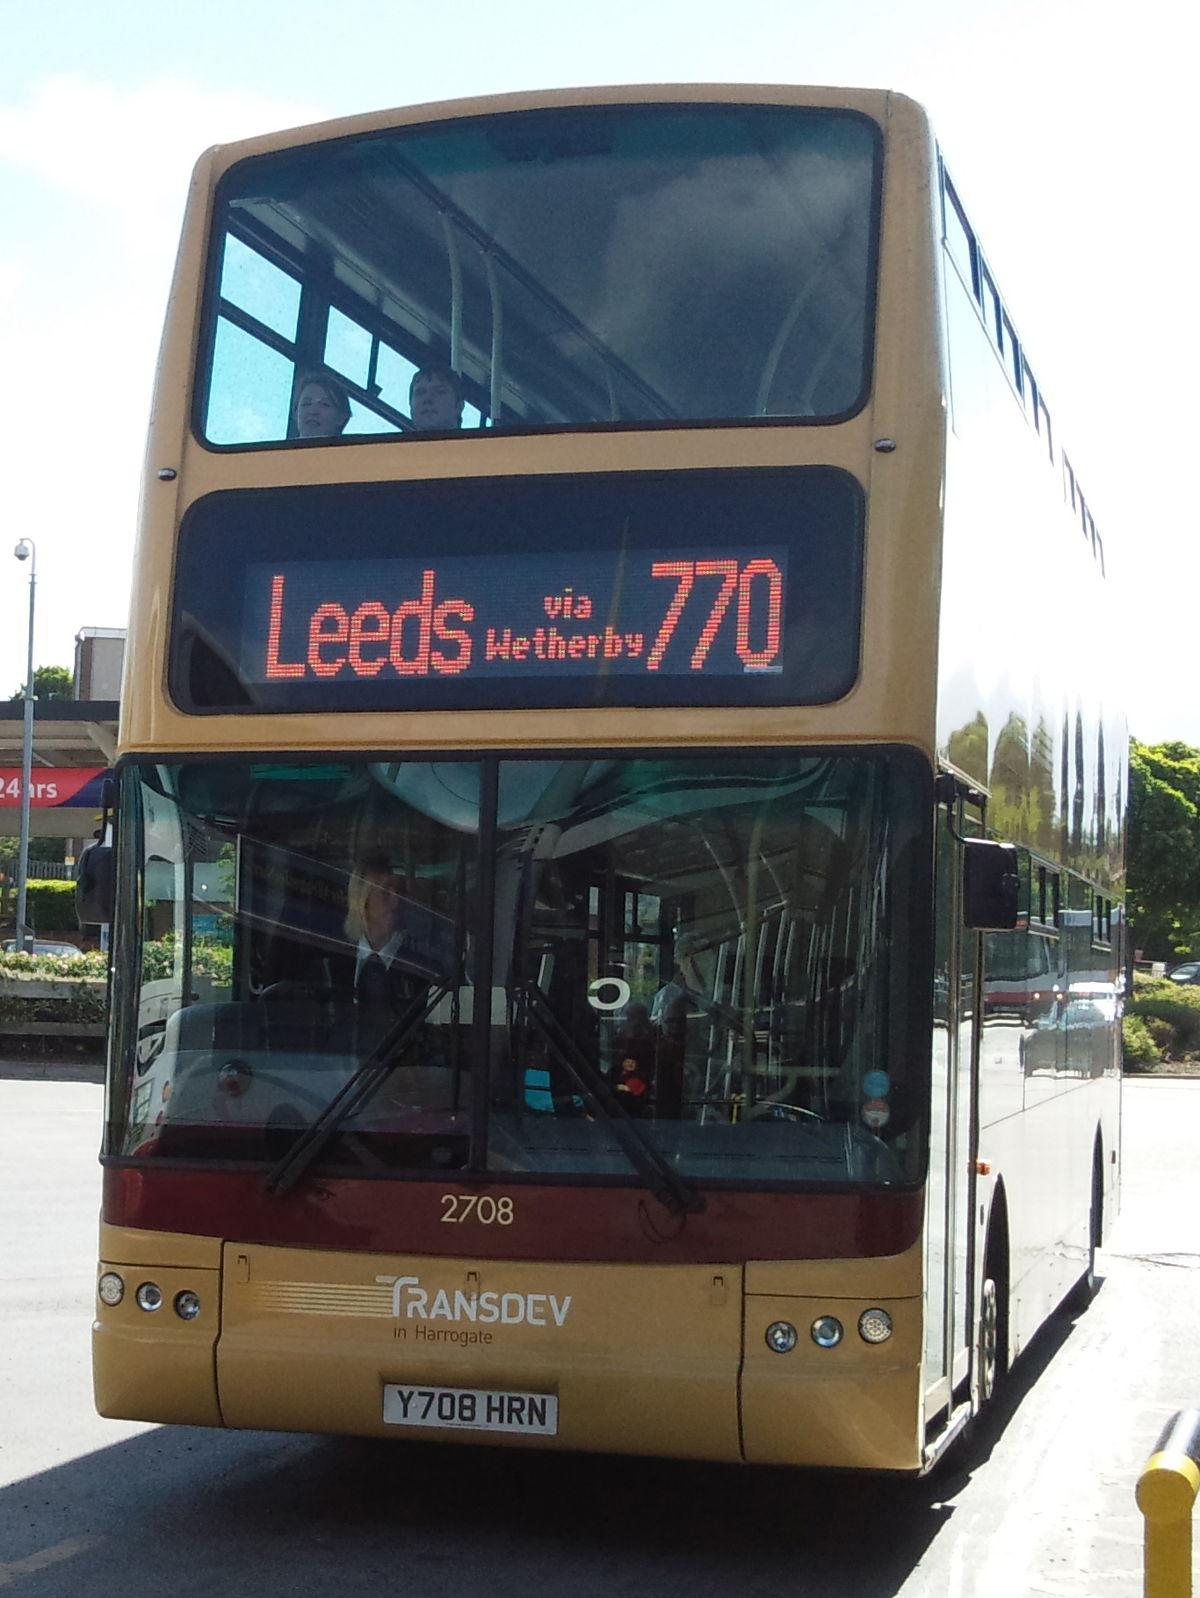 Harrogate Bus Company - Wikipedia